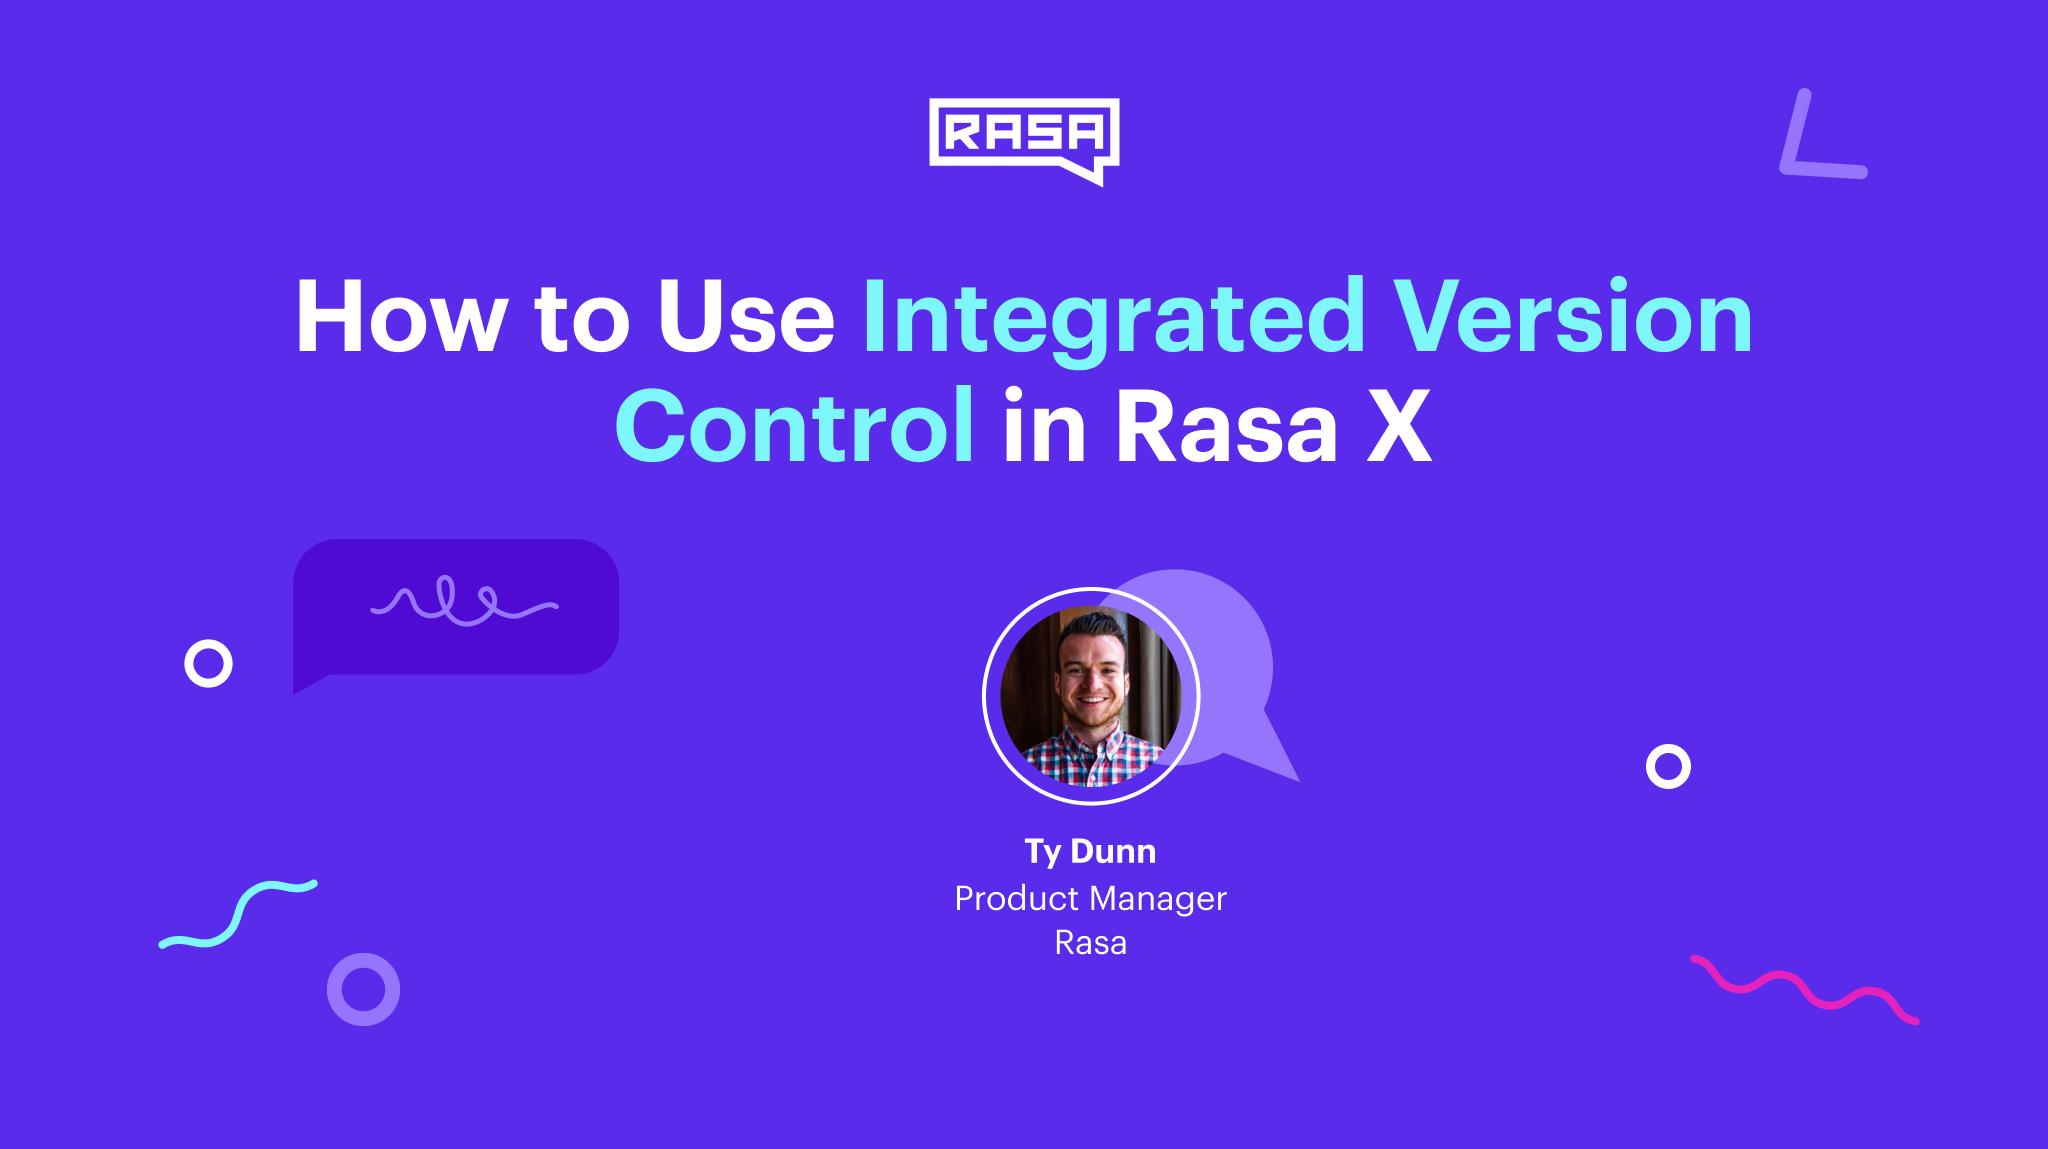 webinar_integrated_version_control